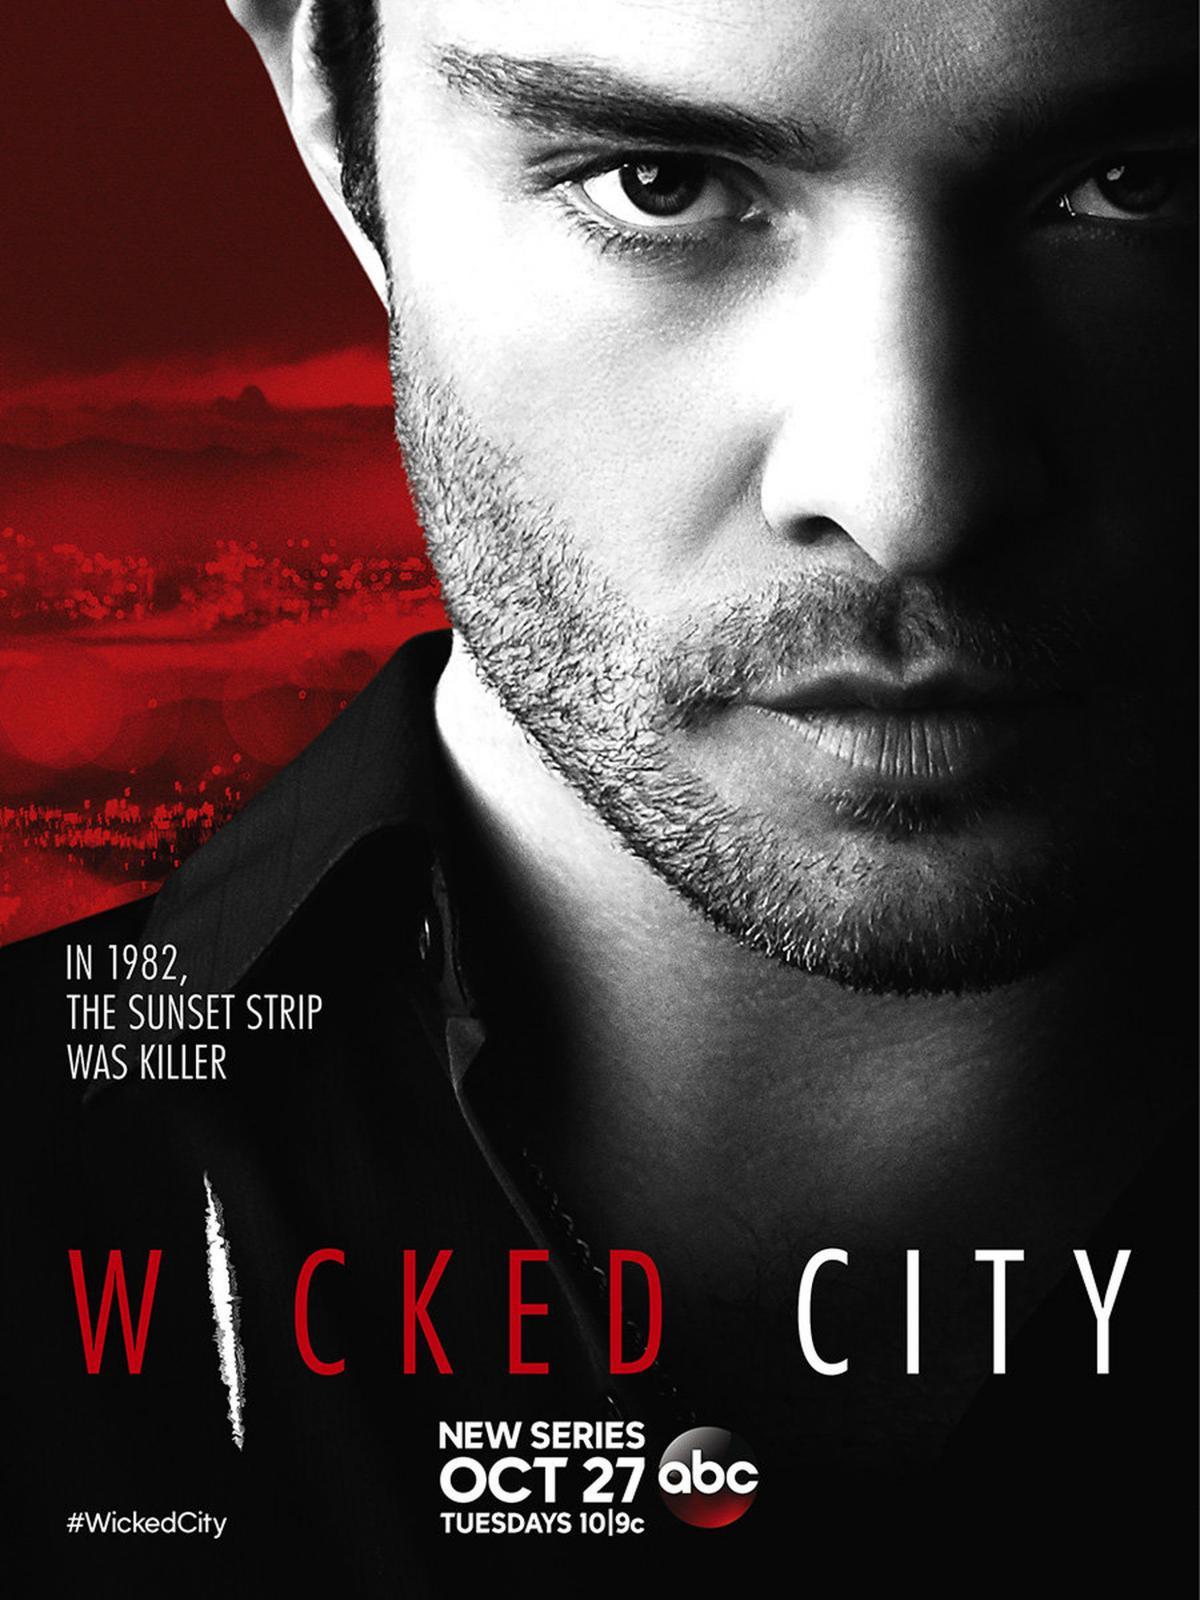 Сериал Злой город (Wicked City, 2015) - ПОСТЕР 1 СЕЗОНА.jpg